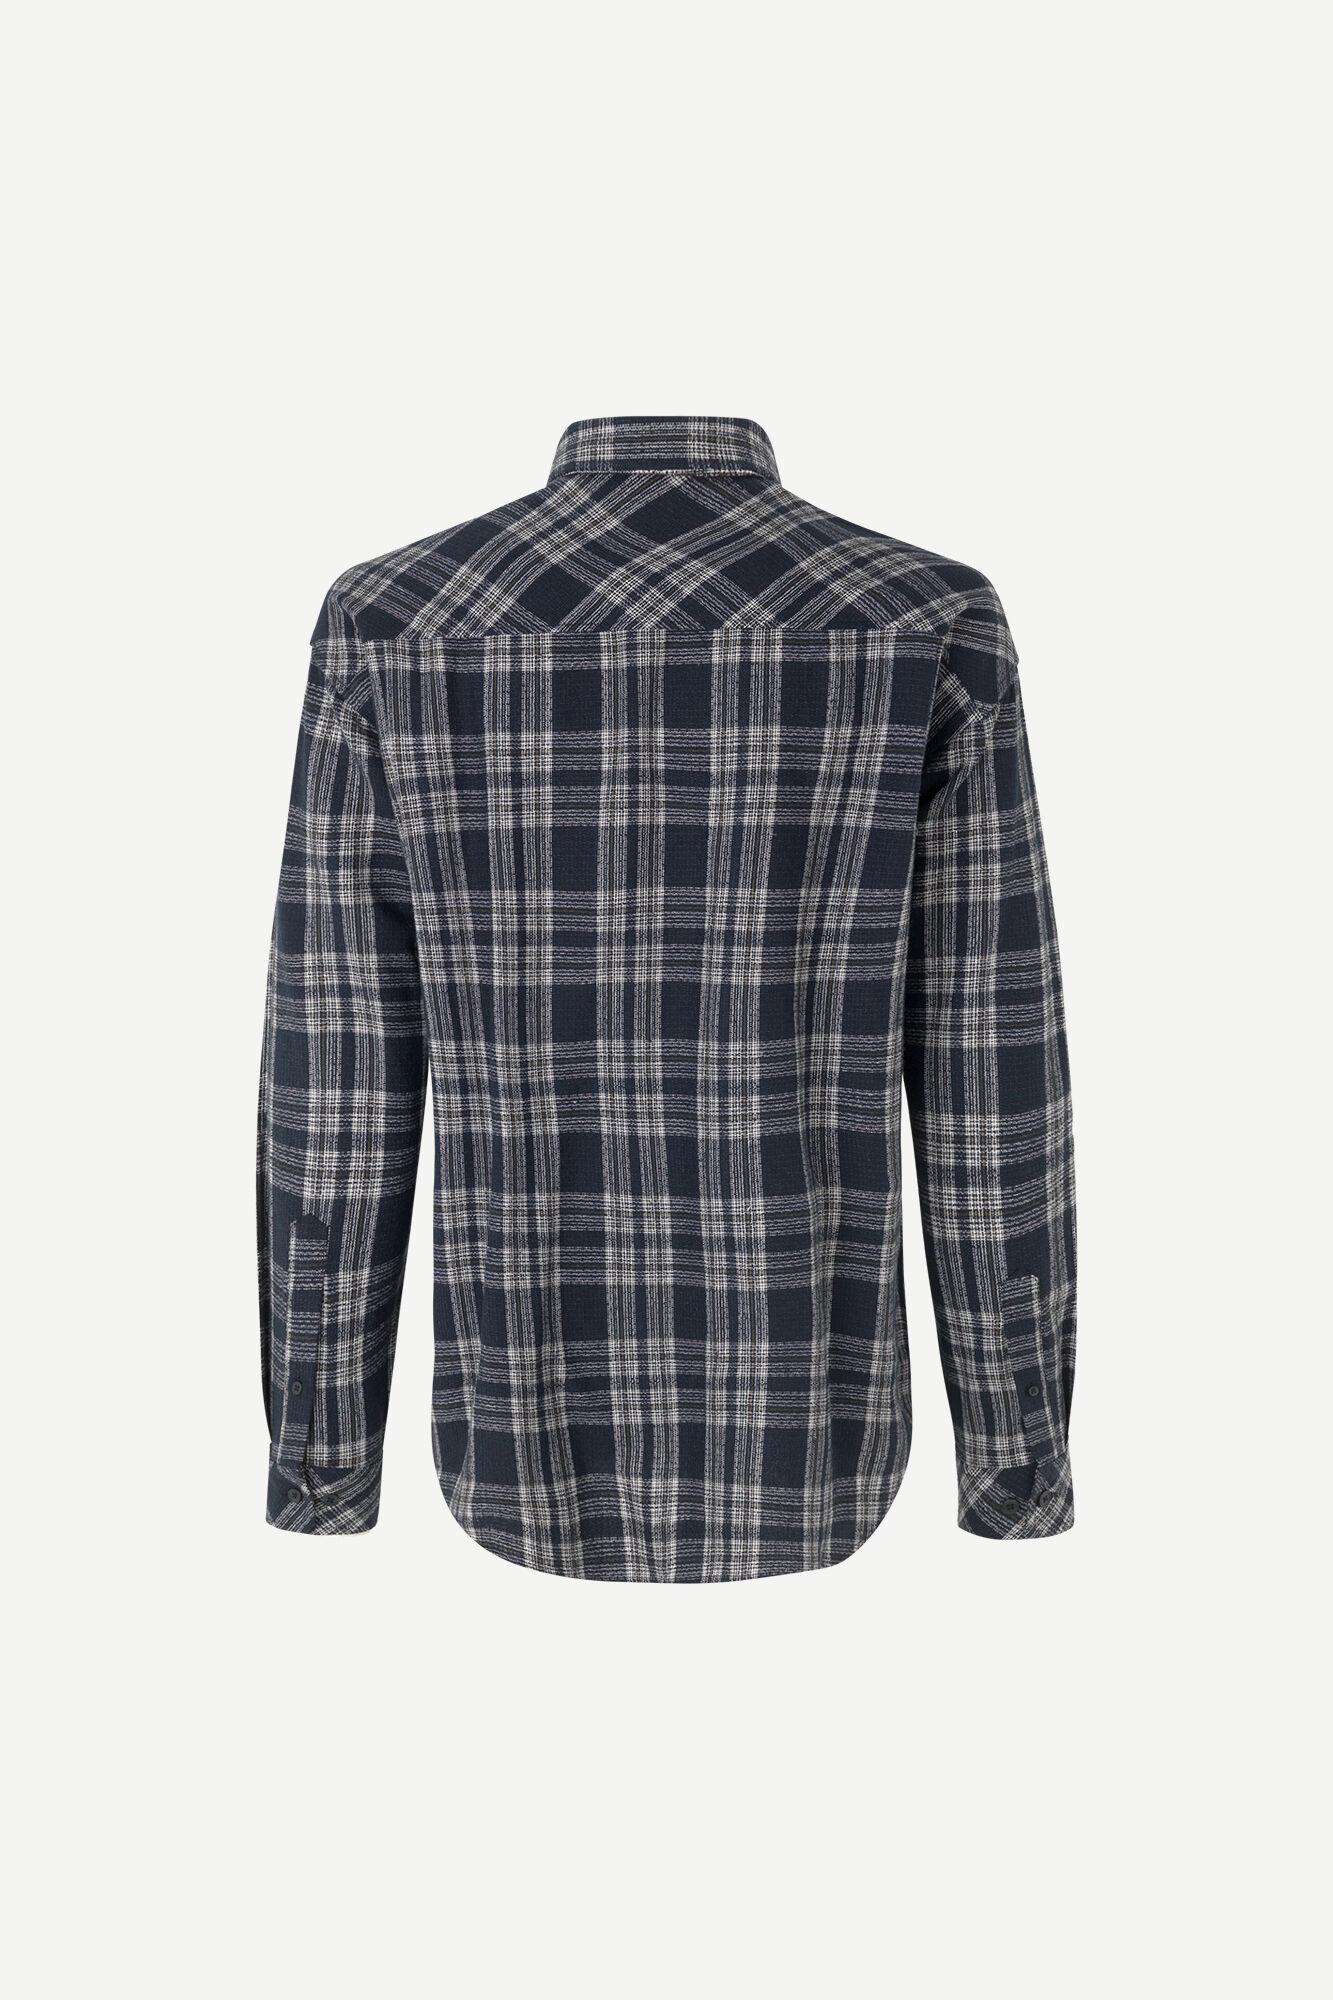 Luan J shirt 14040, NIGHT SKY CH.